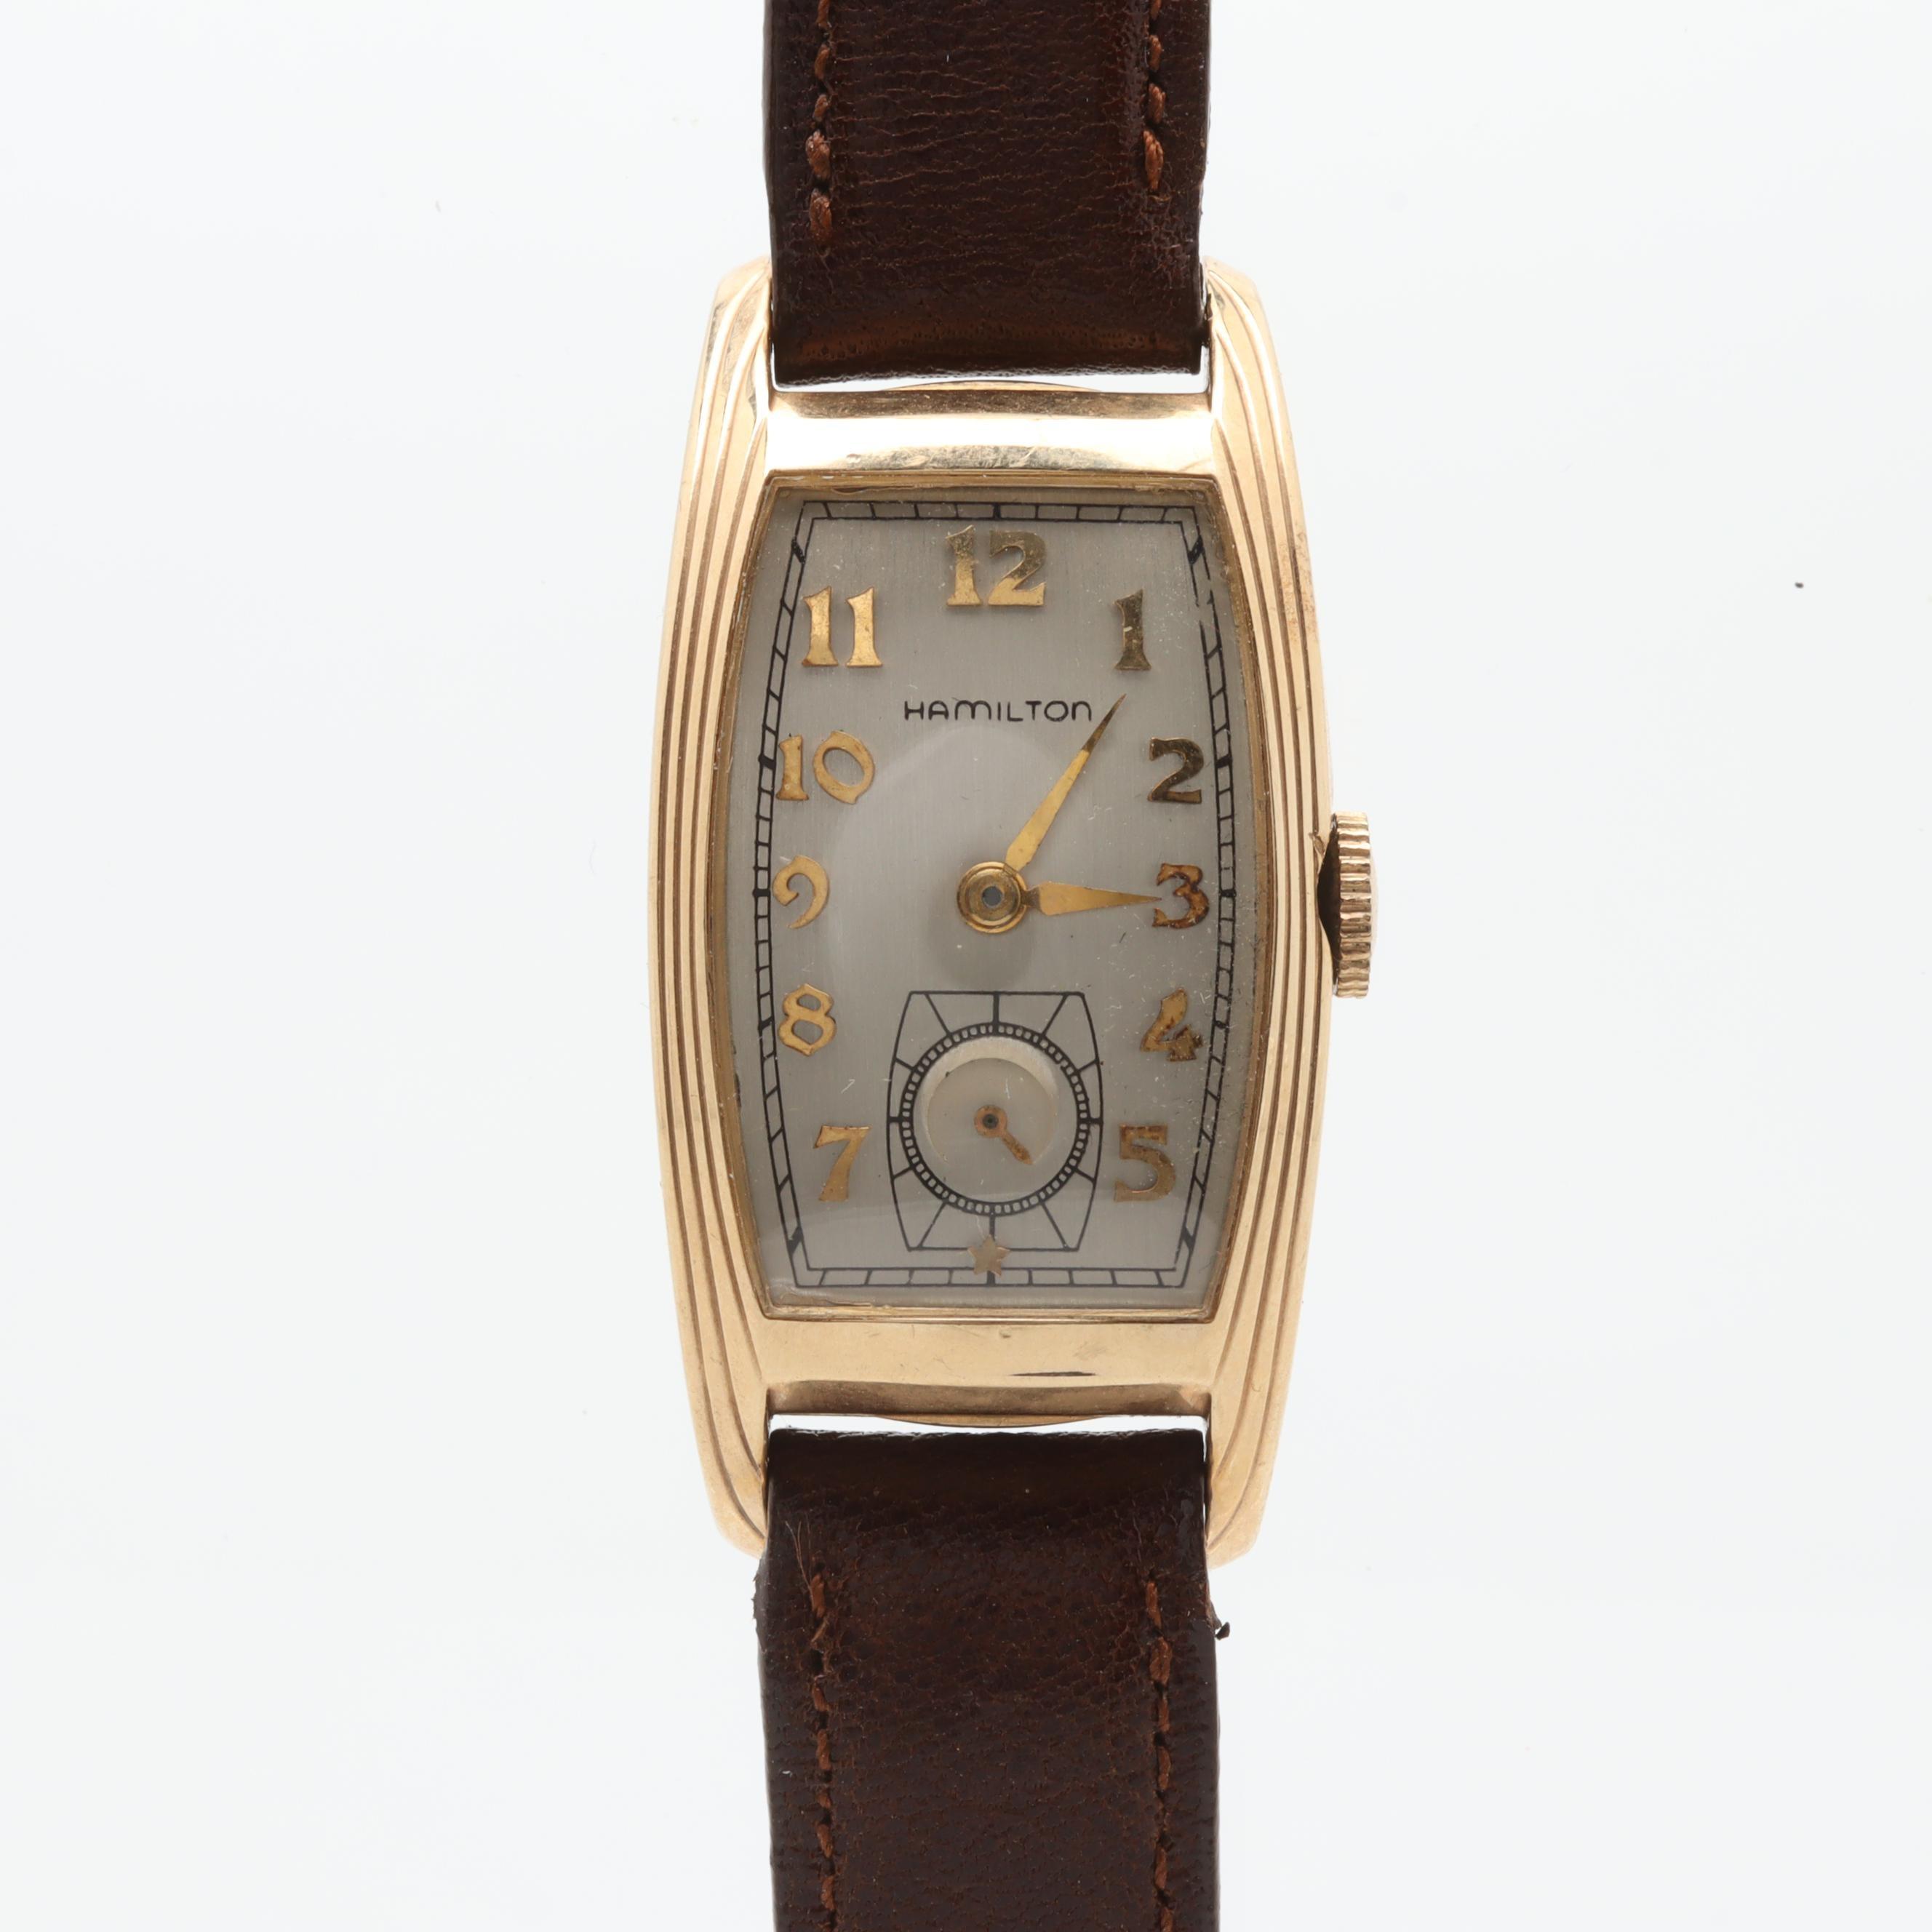 Circa 1938 Hamilton 14K Yellow Gold Filled and Leather Analog Wristwatch